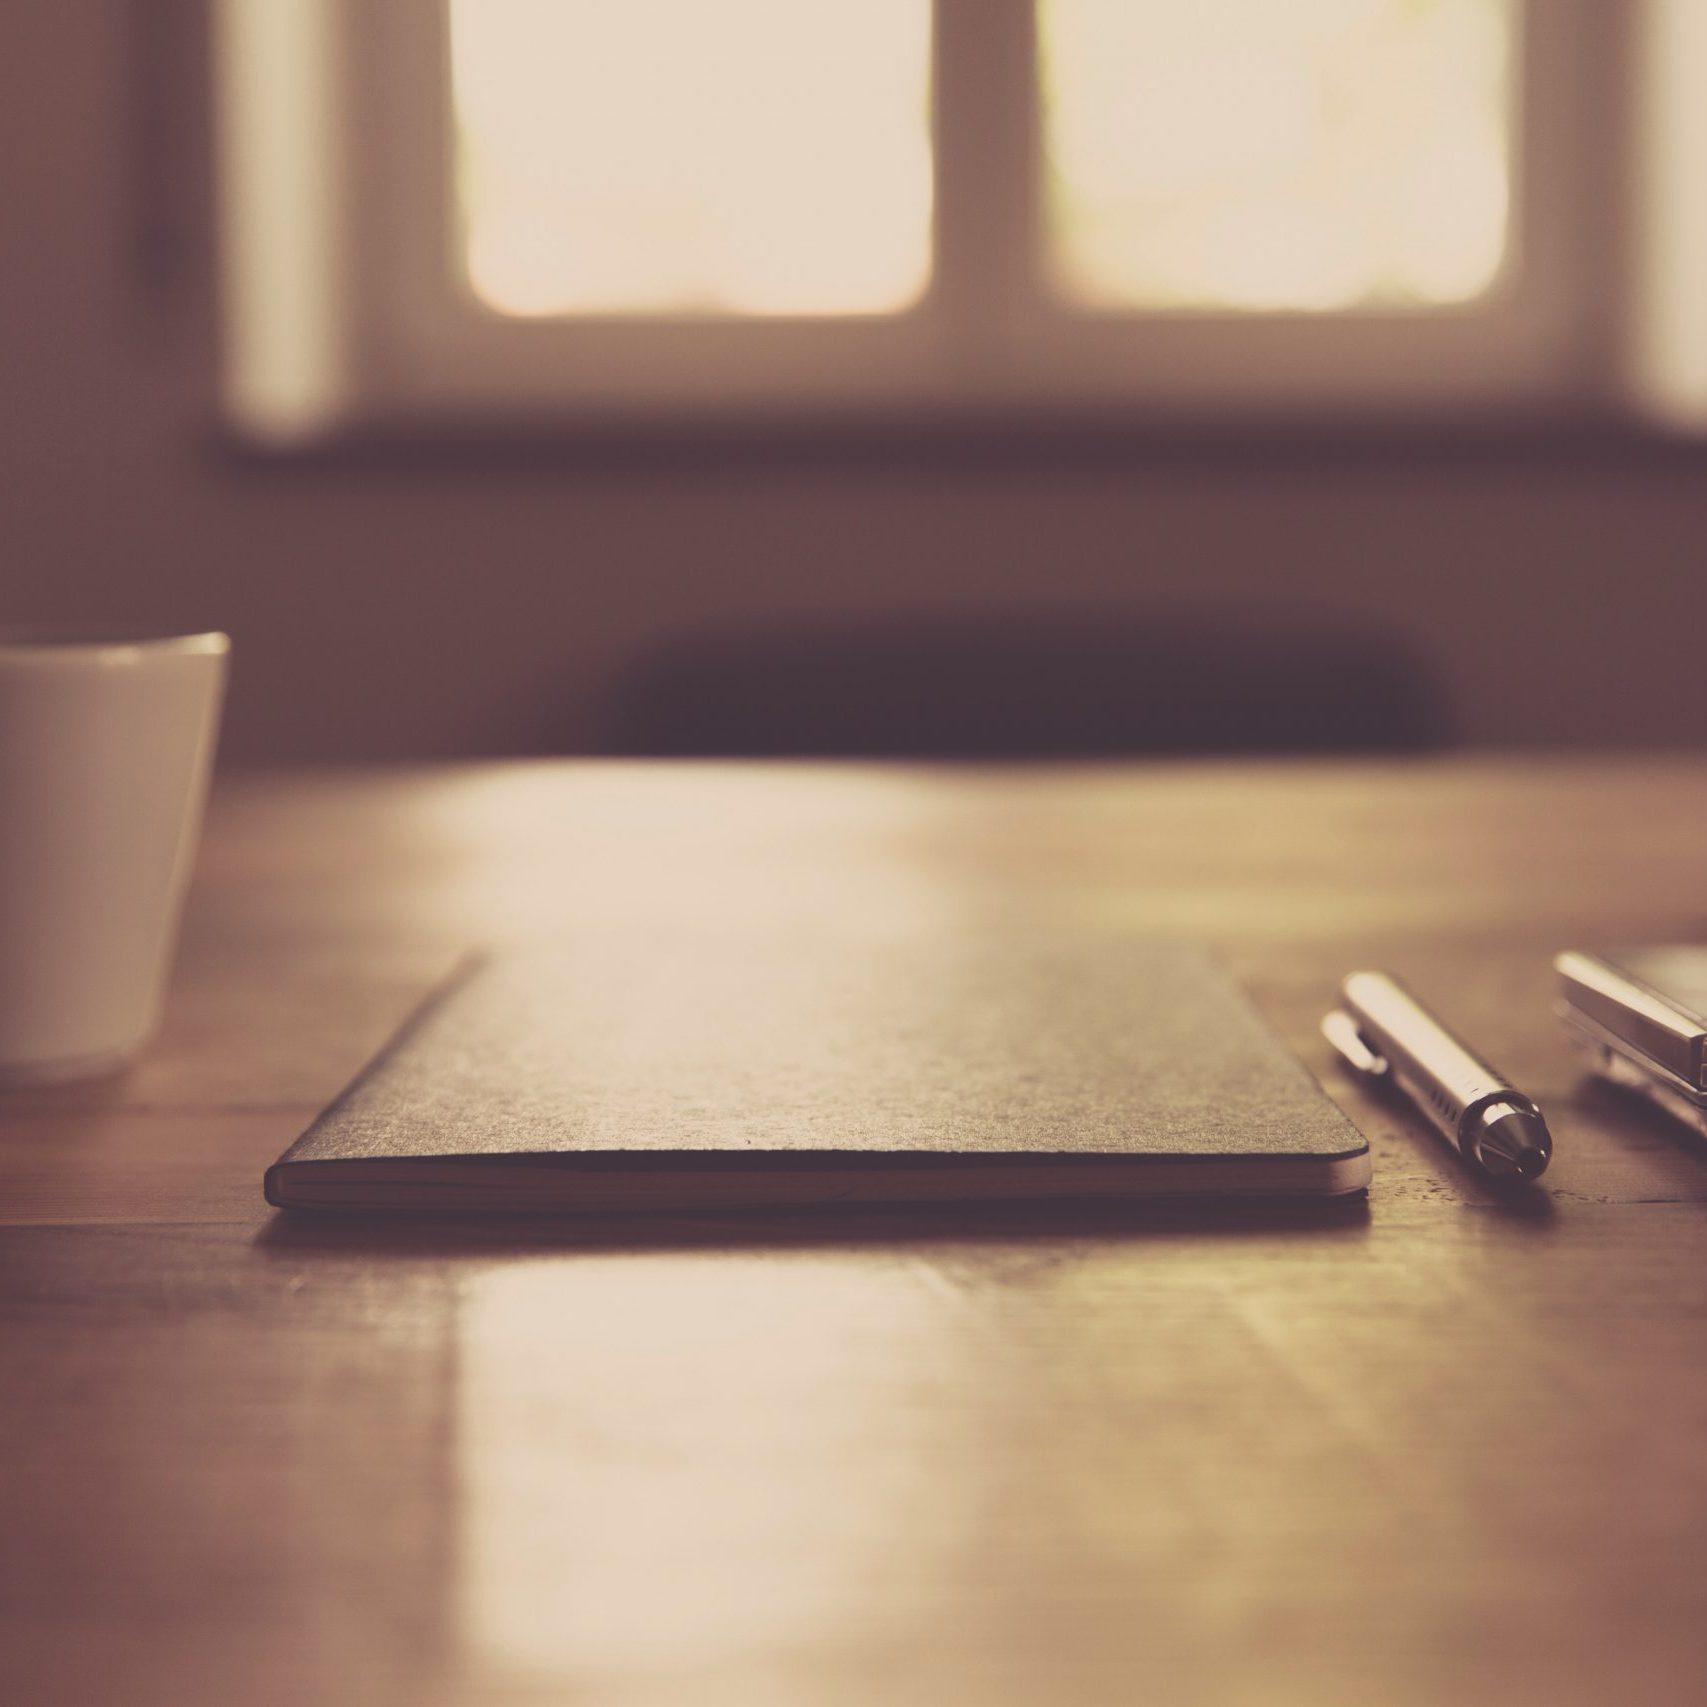 cup-smartphone-desk-notebook-97987